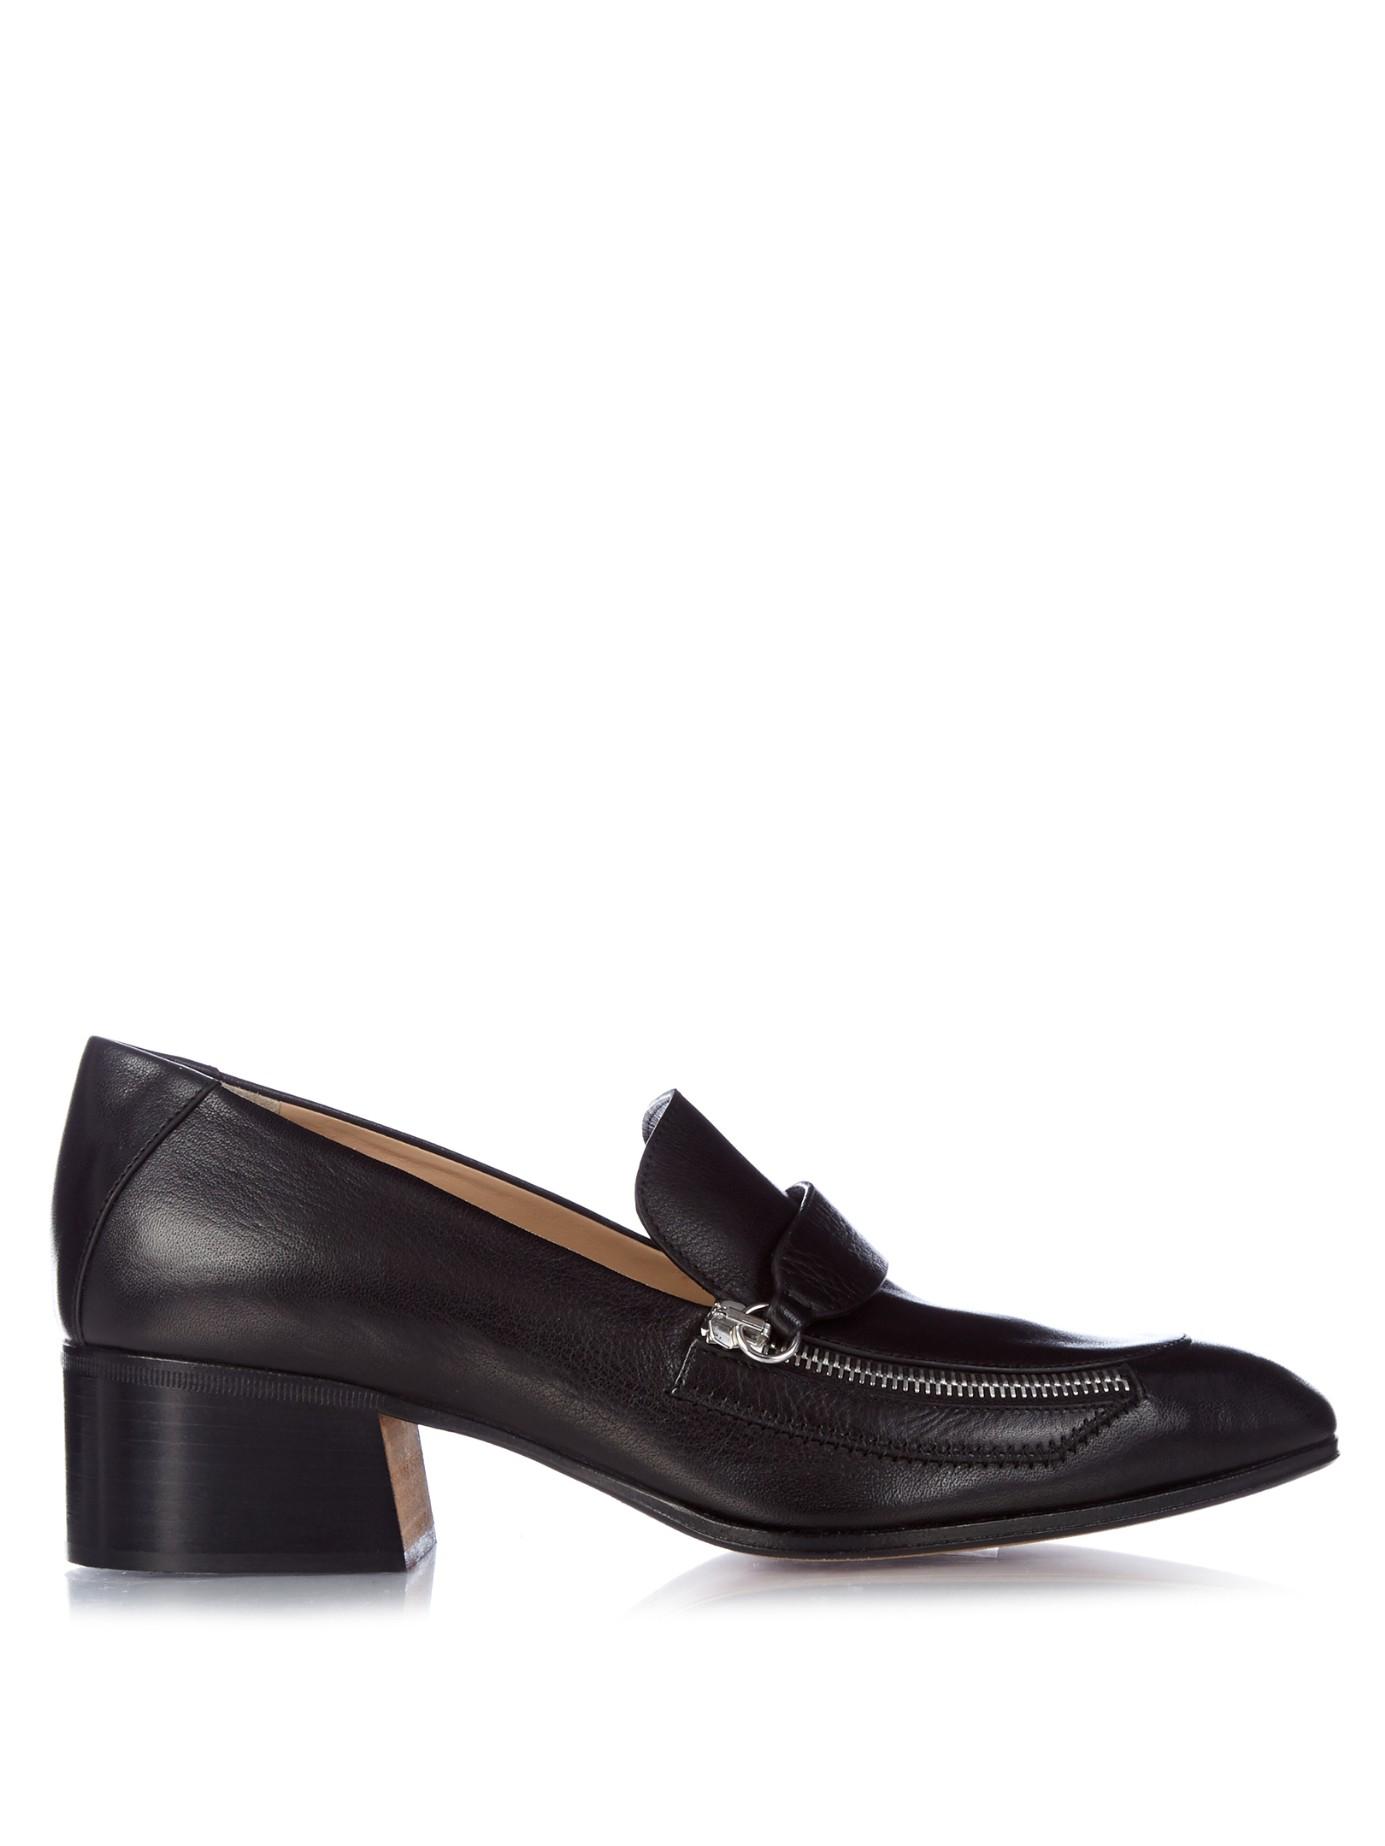 Chlo 233 Iumi Block Heel Leather Loafers In Black Lyst